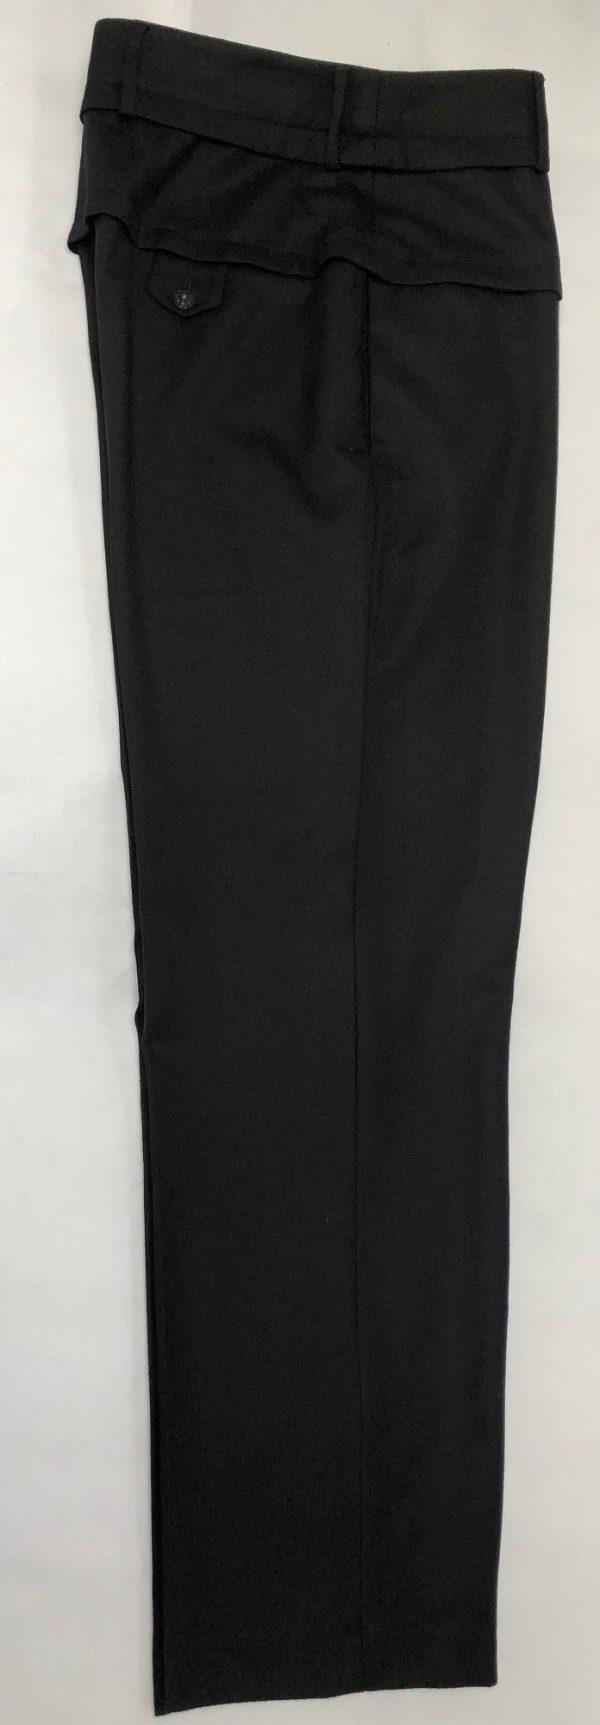 CHANEL Black Wool Trousers – Pants